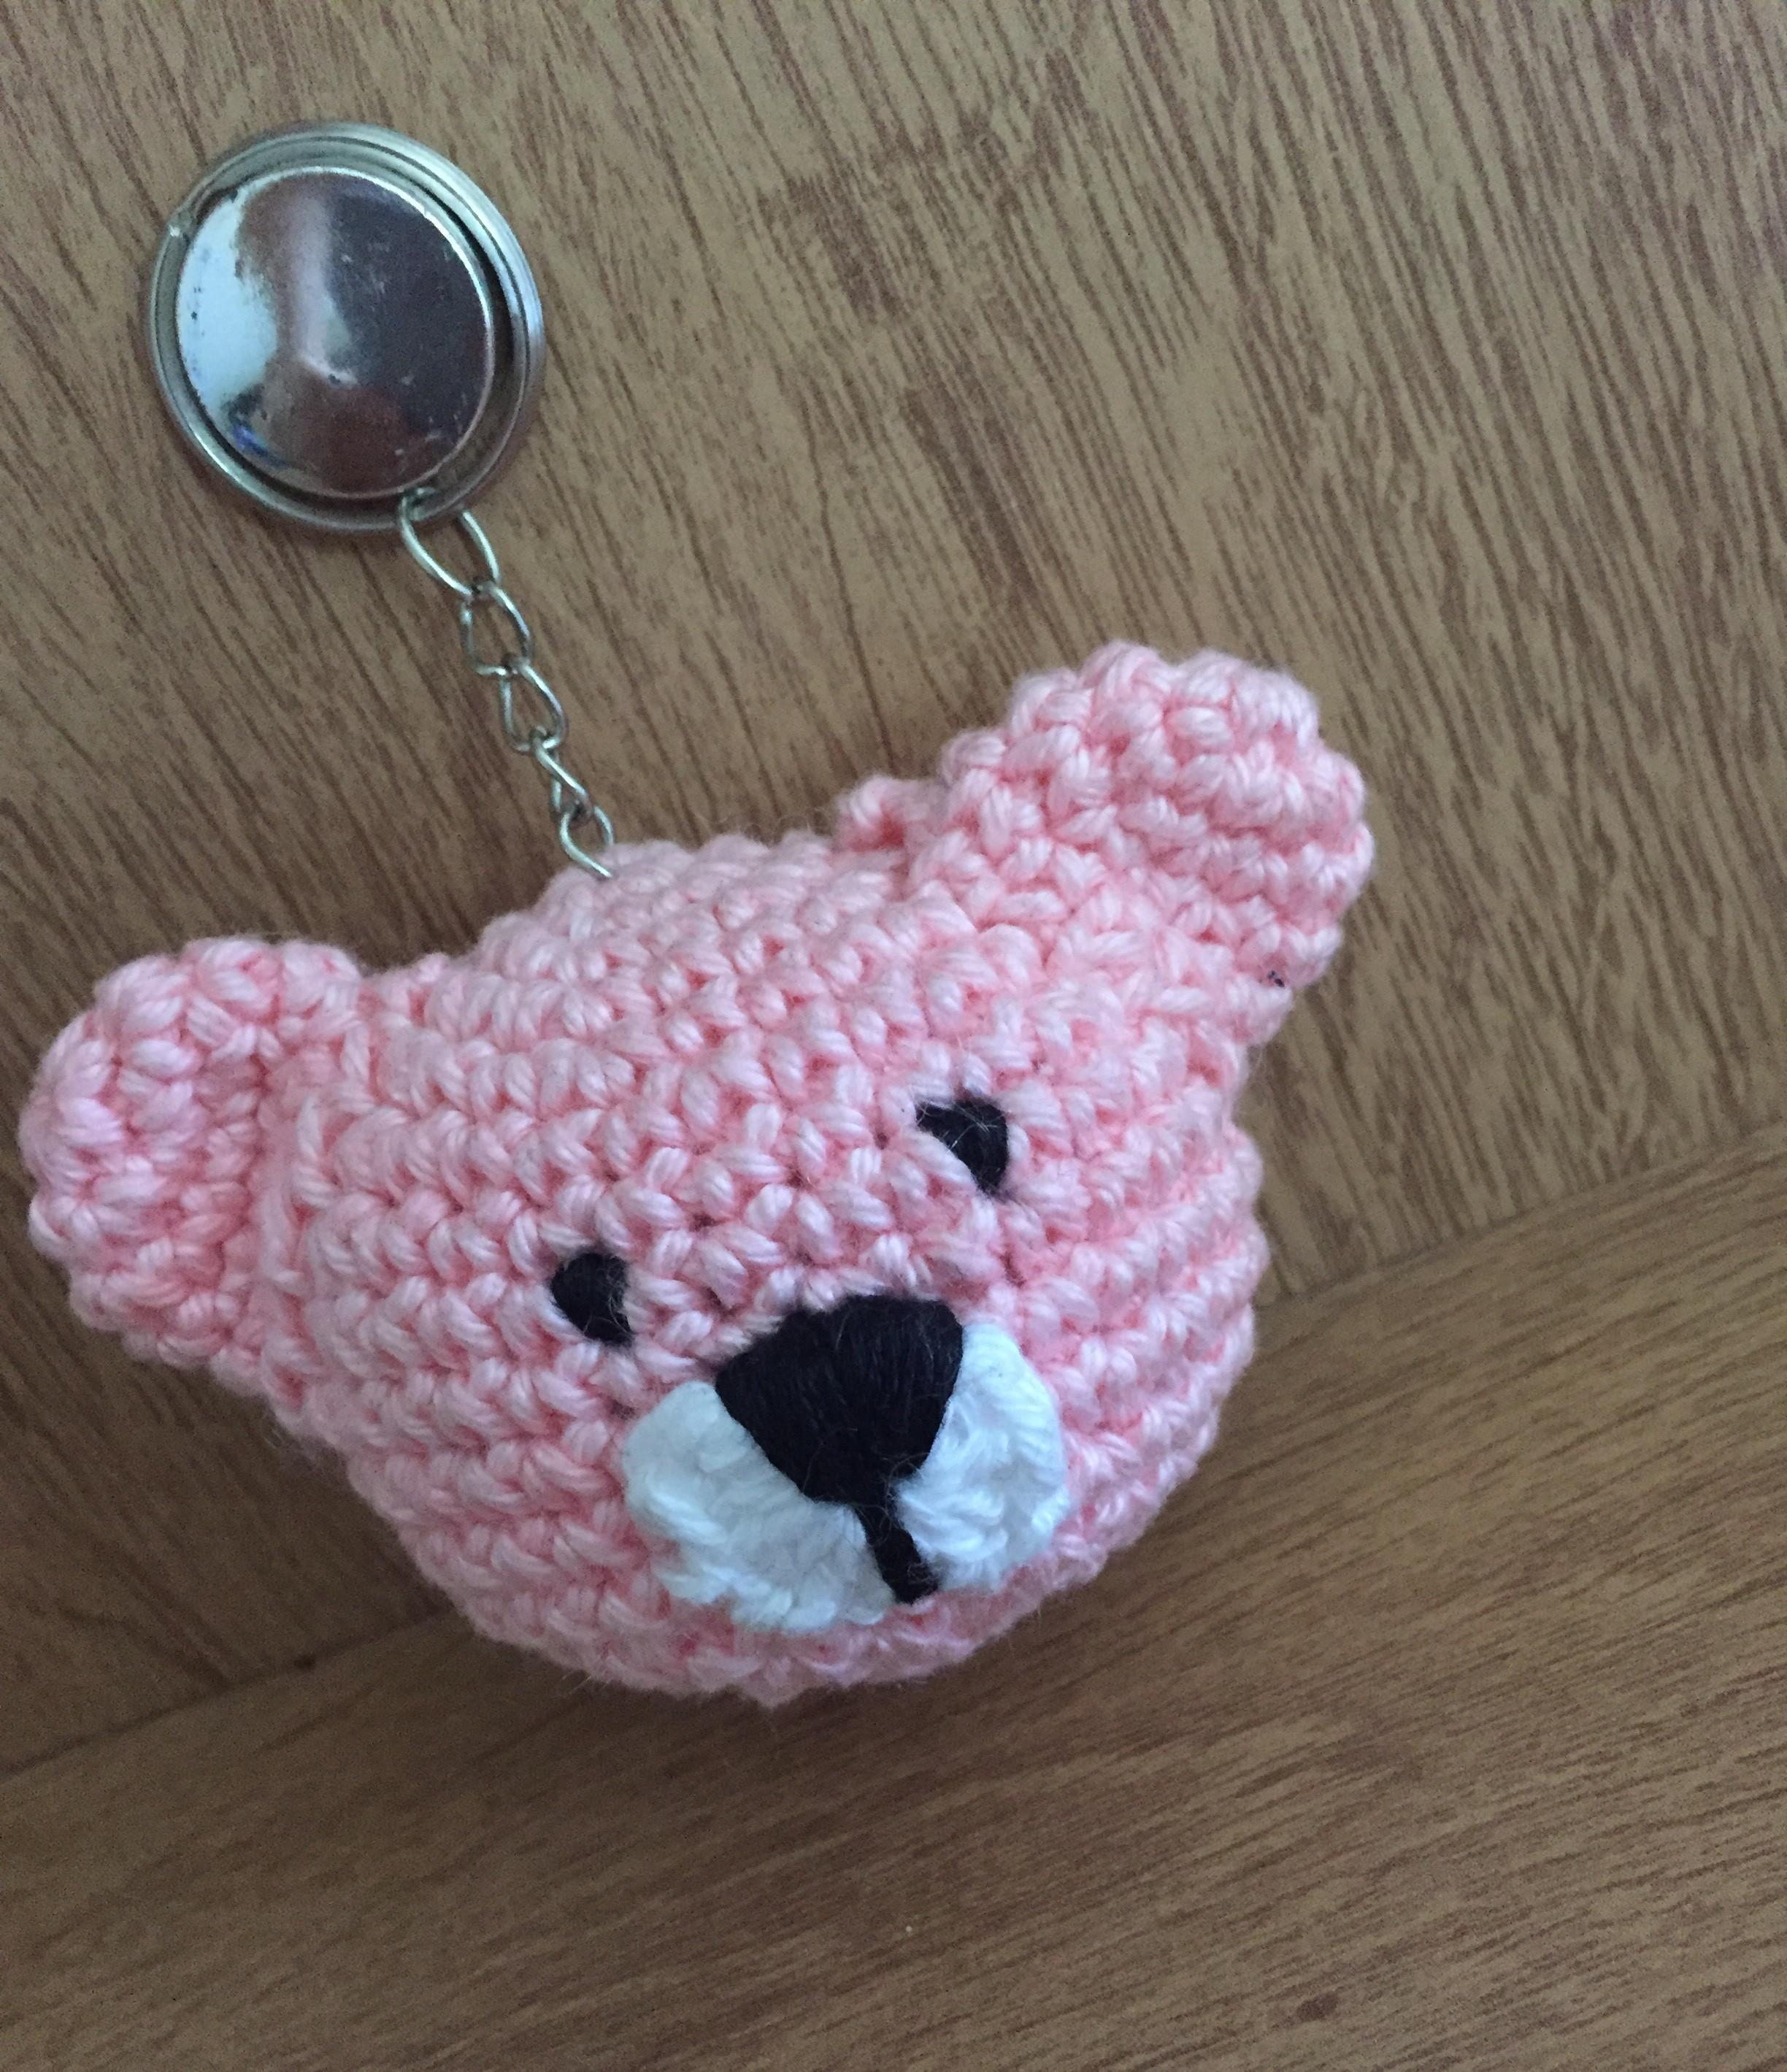 Chaveiro Amigurumi - Urso Teddy Bear no Elo7   Leila Amigurumi ...   2838x2448